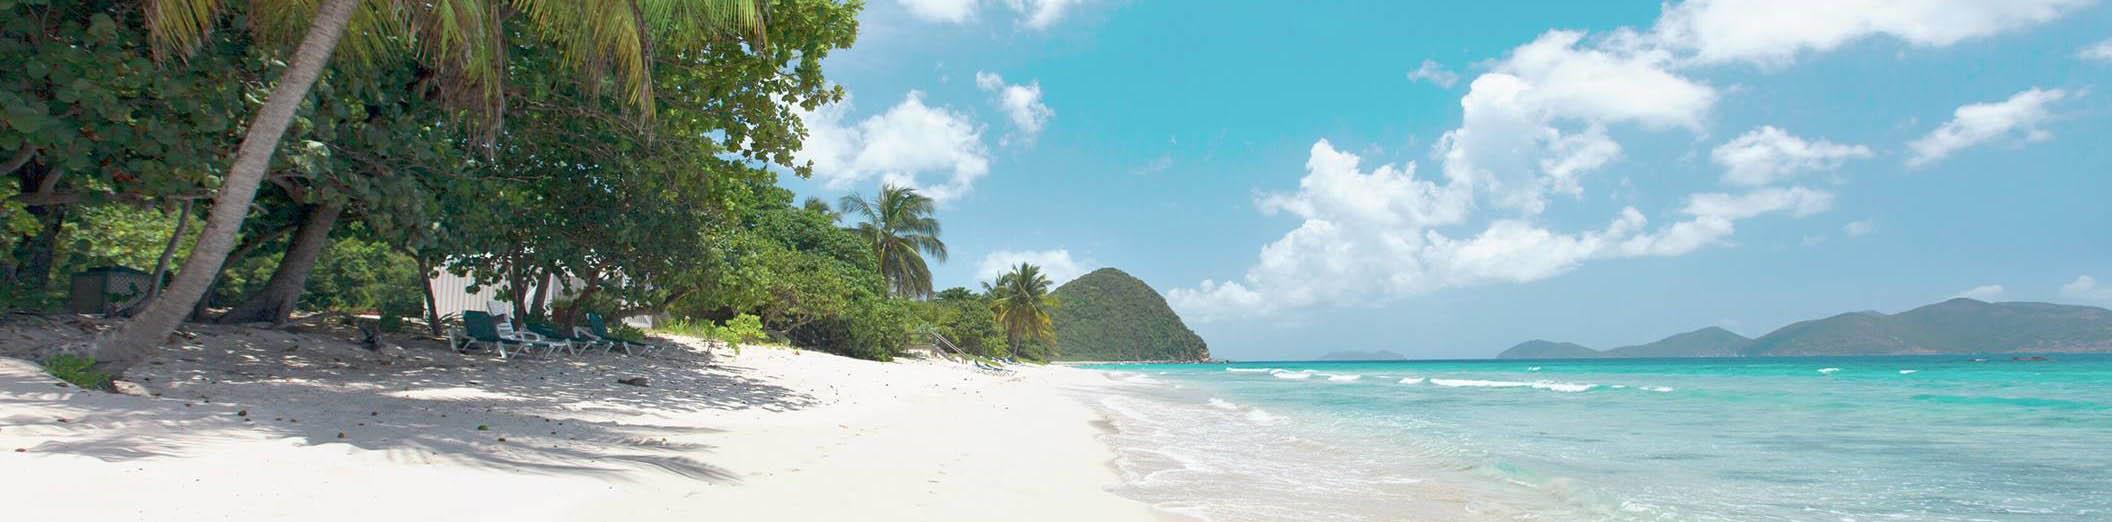 Long Bay Resort, Tortola